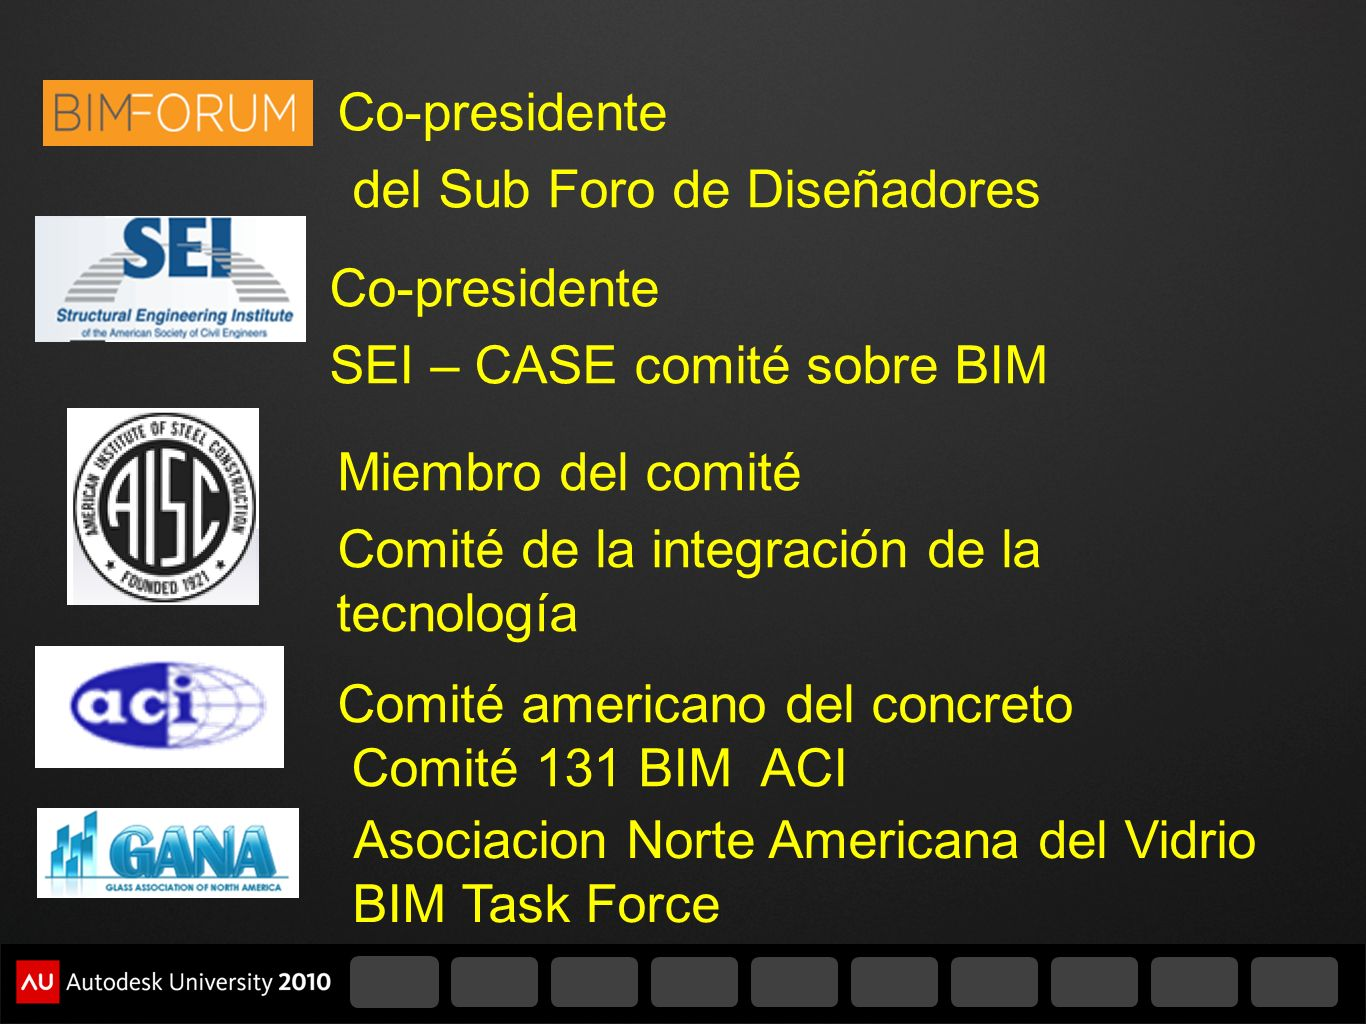 LOD estructural con CSI MasterFormat XX YY ZZ.## XX - DIVISIÓN YY & ZZ - REVELADOR SECUNDARIO ## definido por el usario